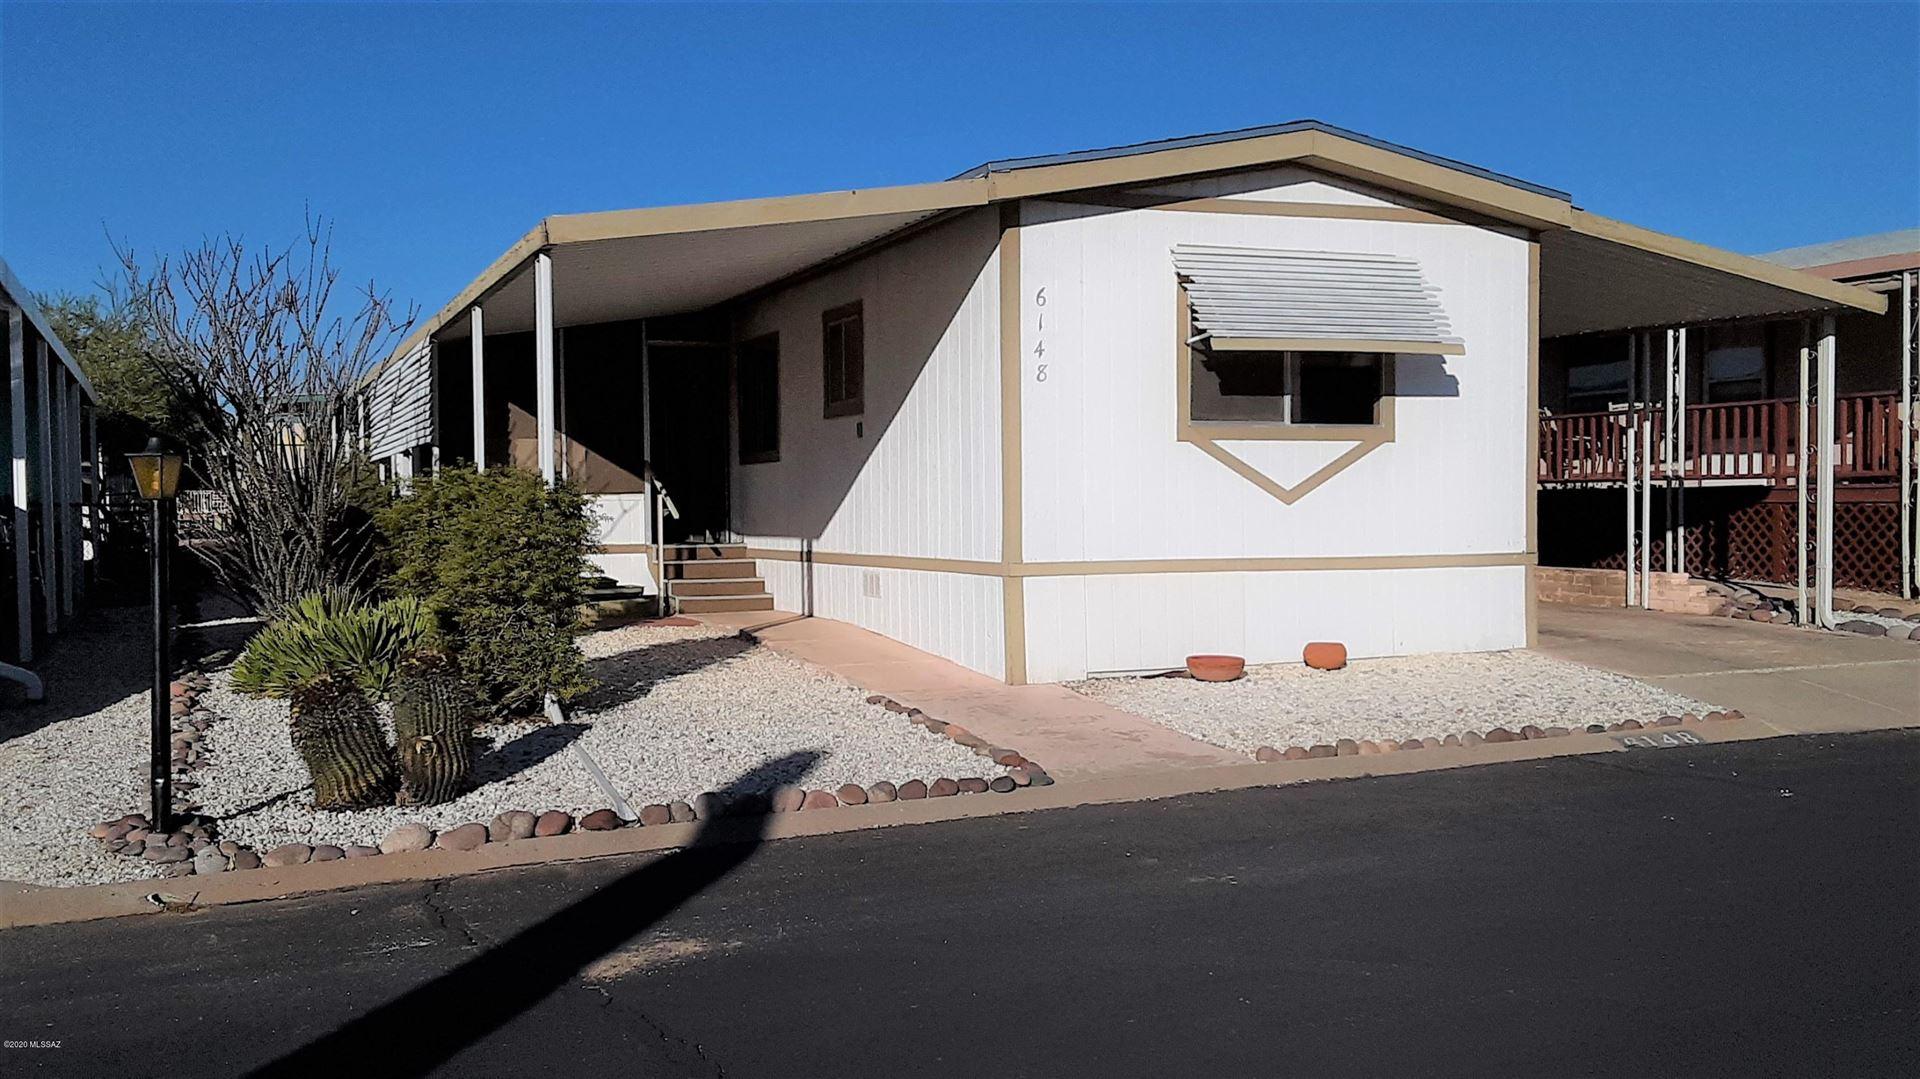 6148 S Mainside Drive, Tucson, AZ 85746 - MLS#: 22102370